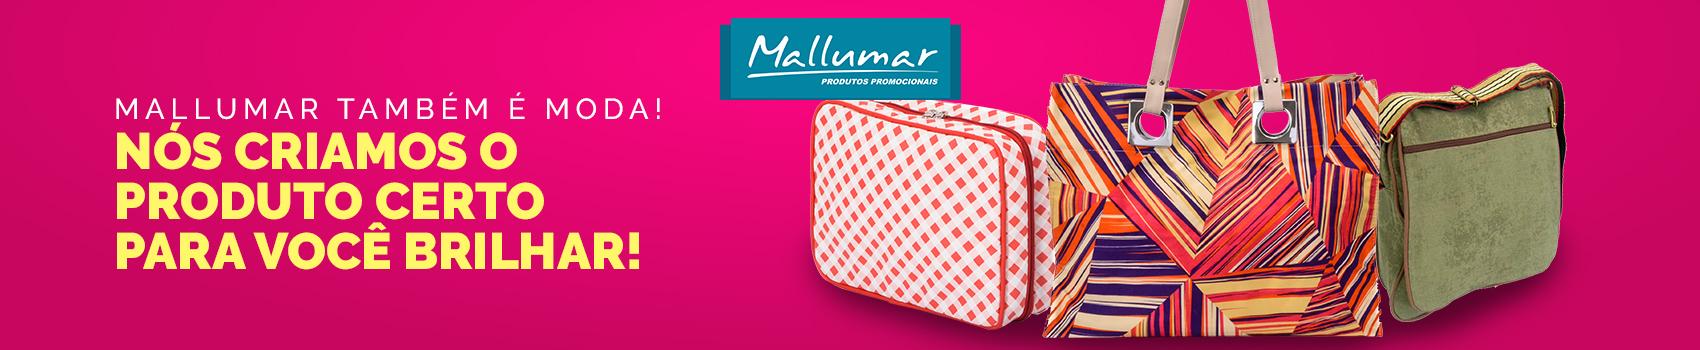 Mallumar